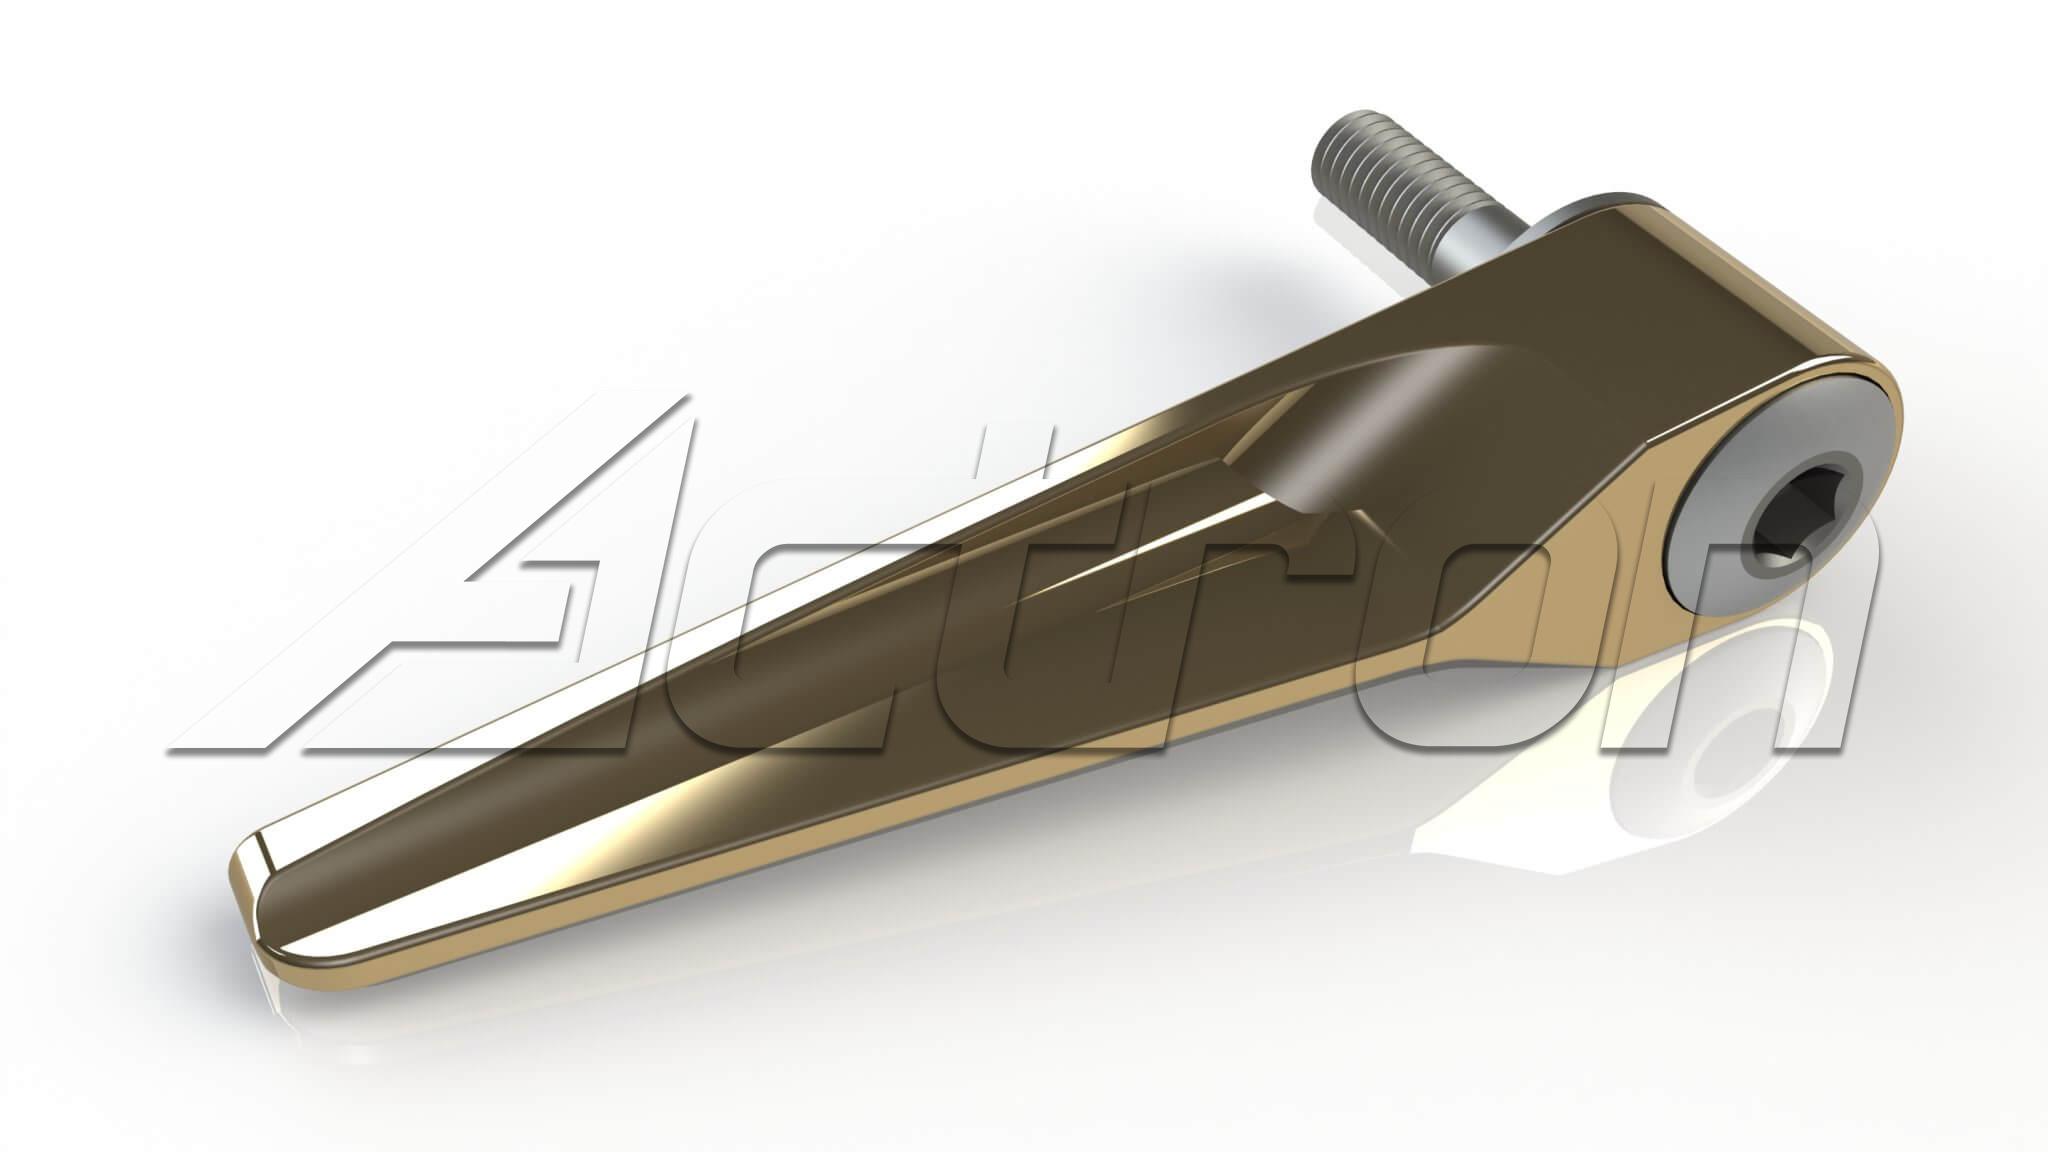 1-4-turn-retainer-4614-a35660.jpg